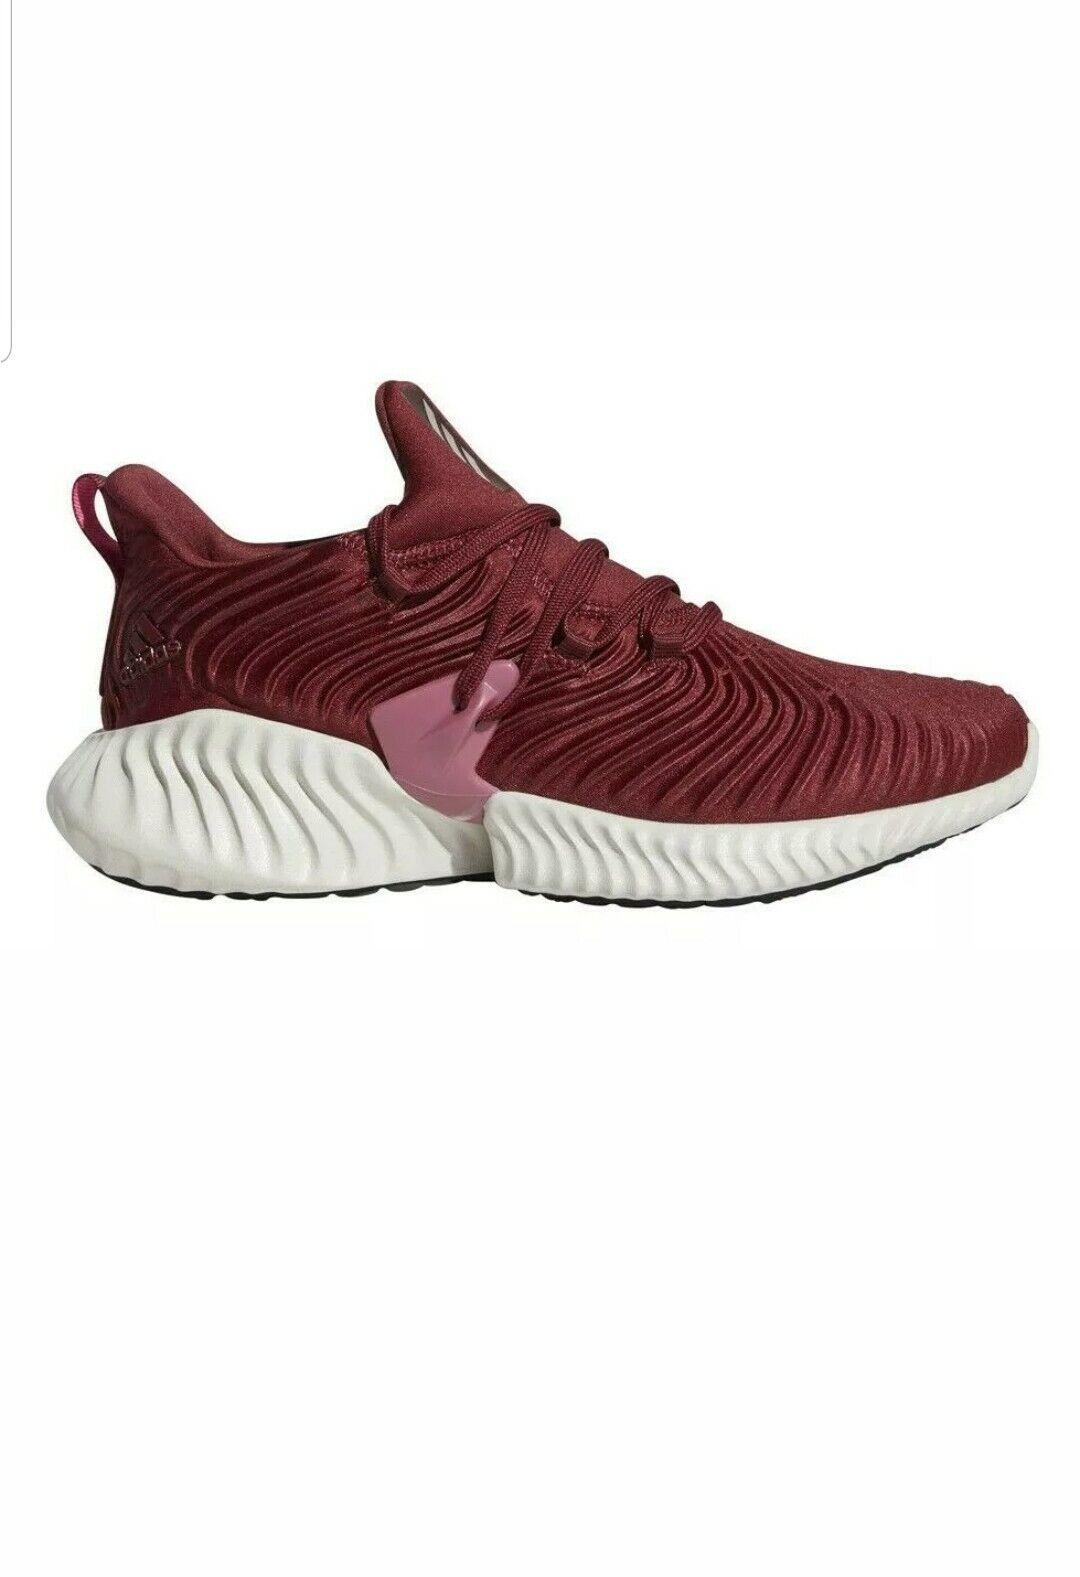 836d02fb9a4 Womens Adidas Alphabounce Instinct W W W Running Sneaker - Maroon ...